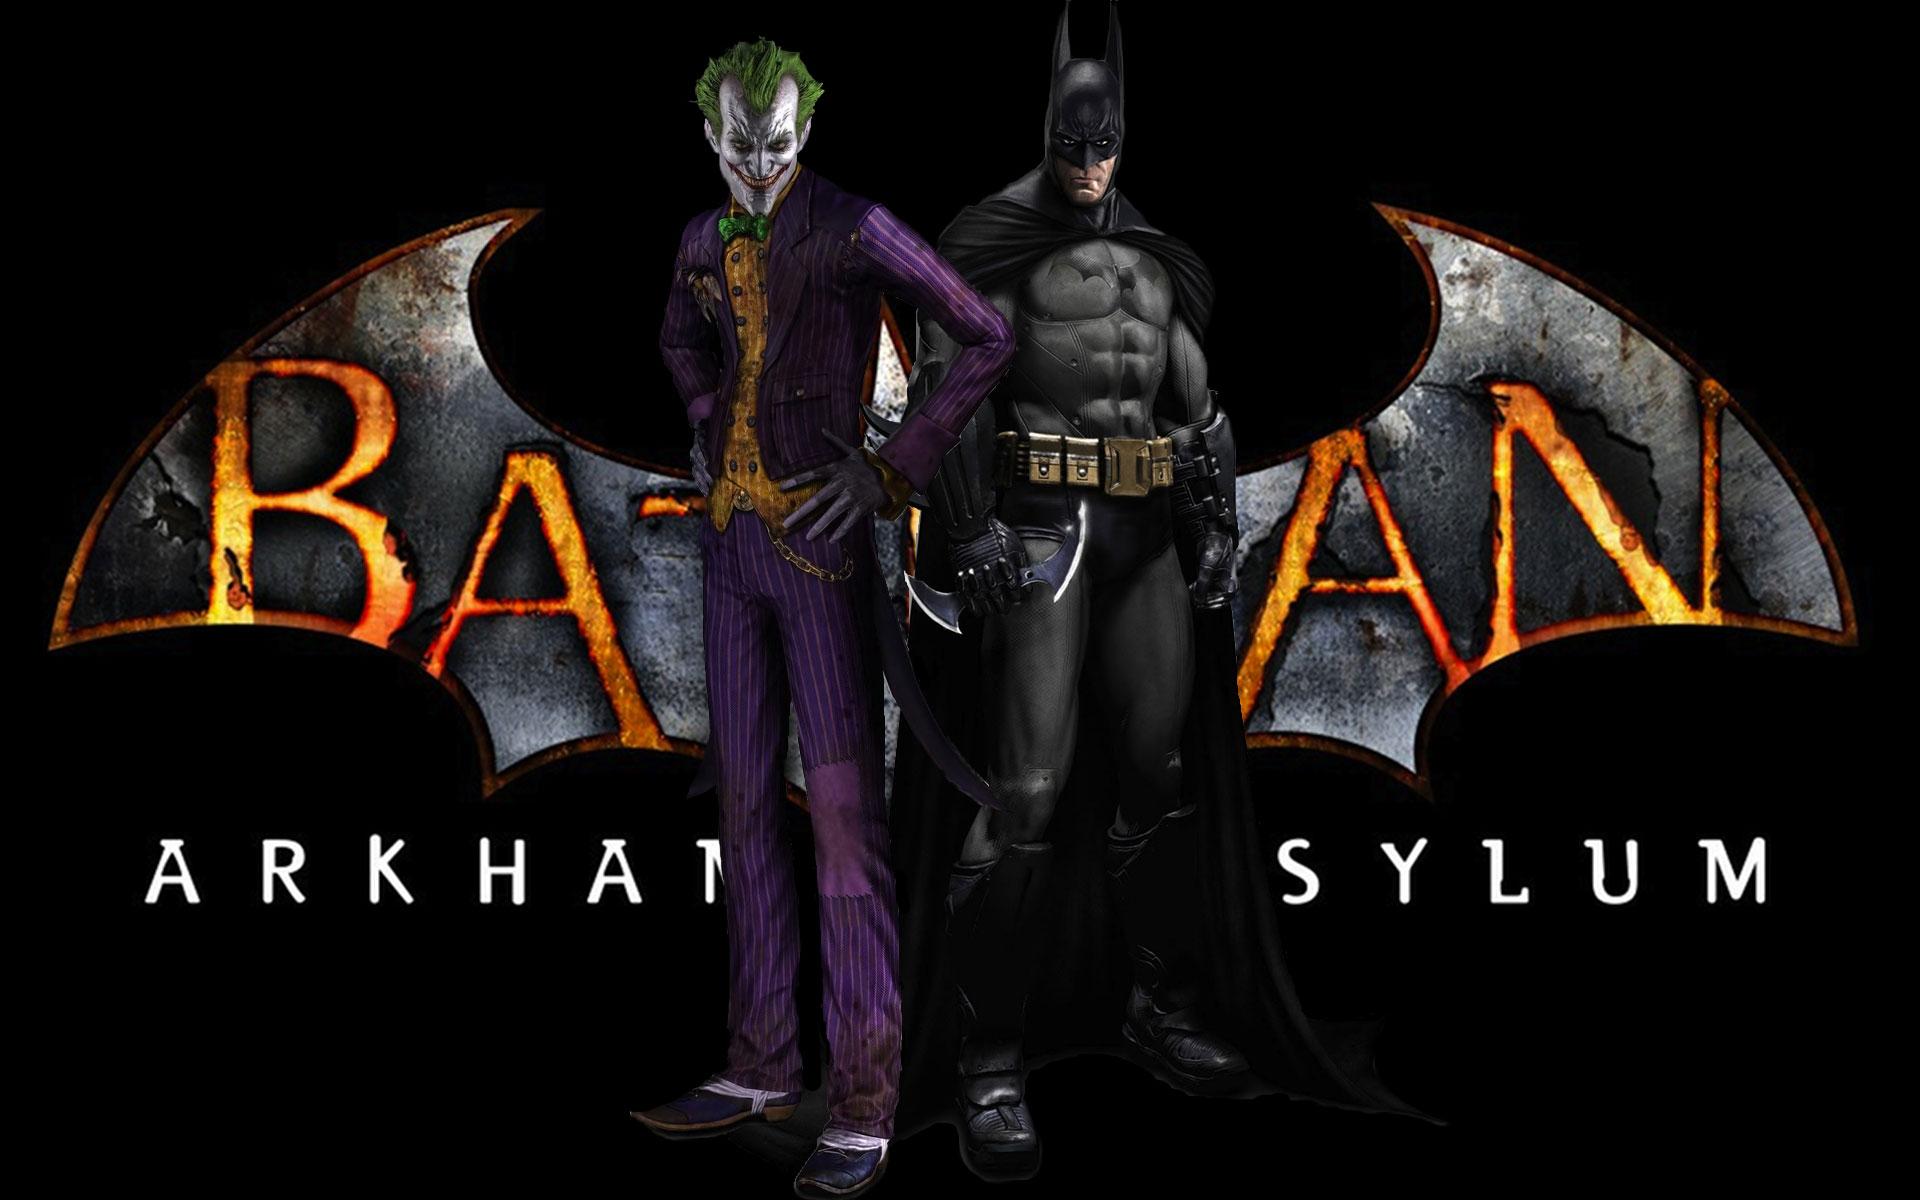 Batman Arkham Asylum Wallpapers 5670 Hd Wallpapers in Games   Imagesci 1920x1200